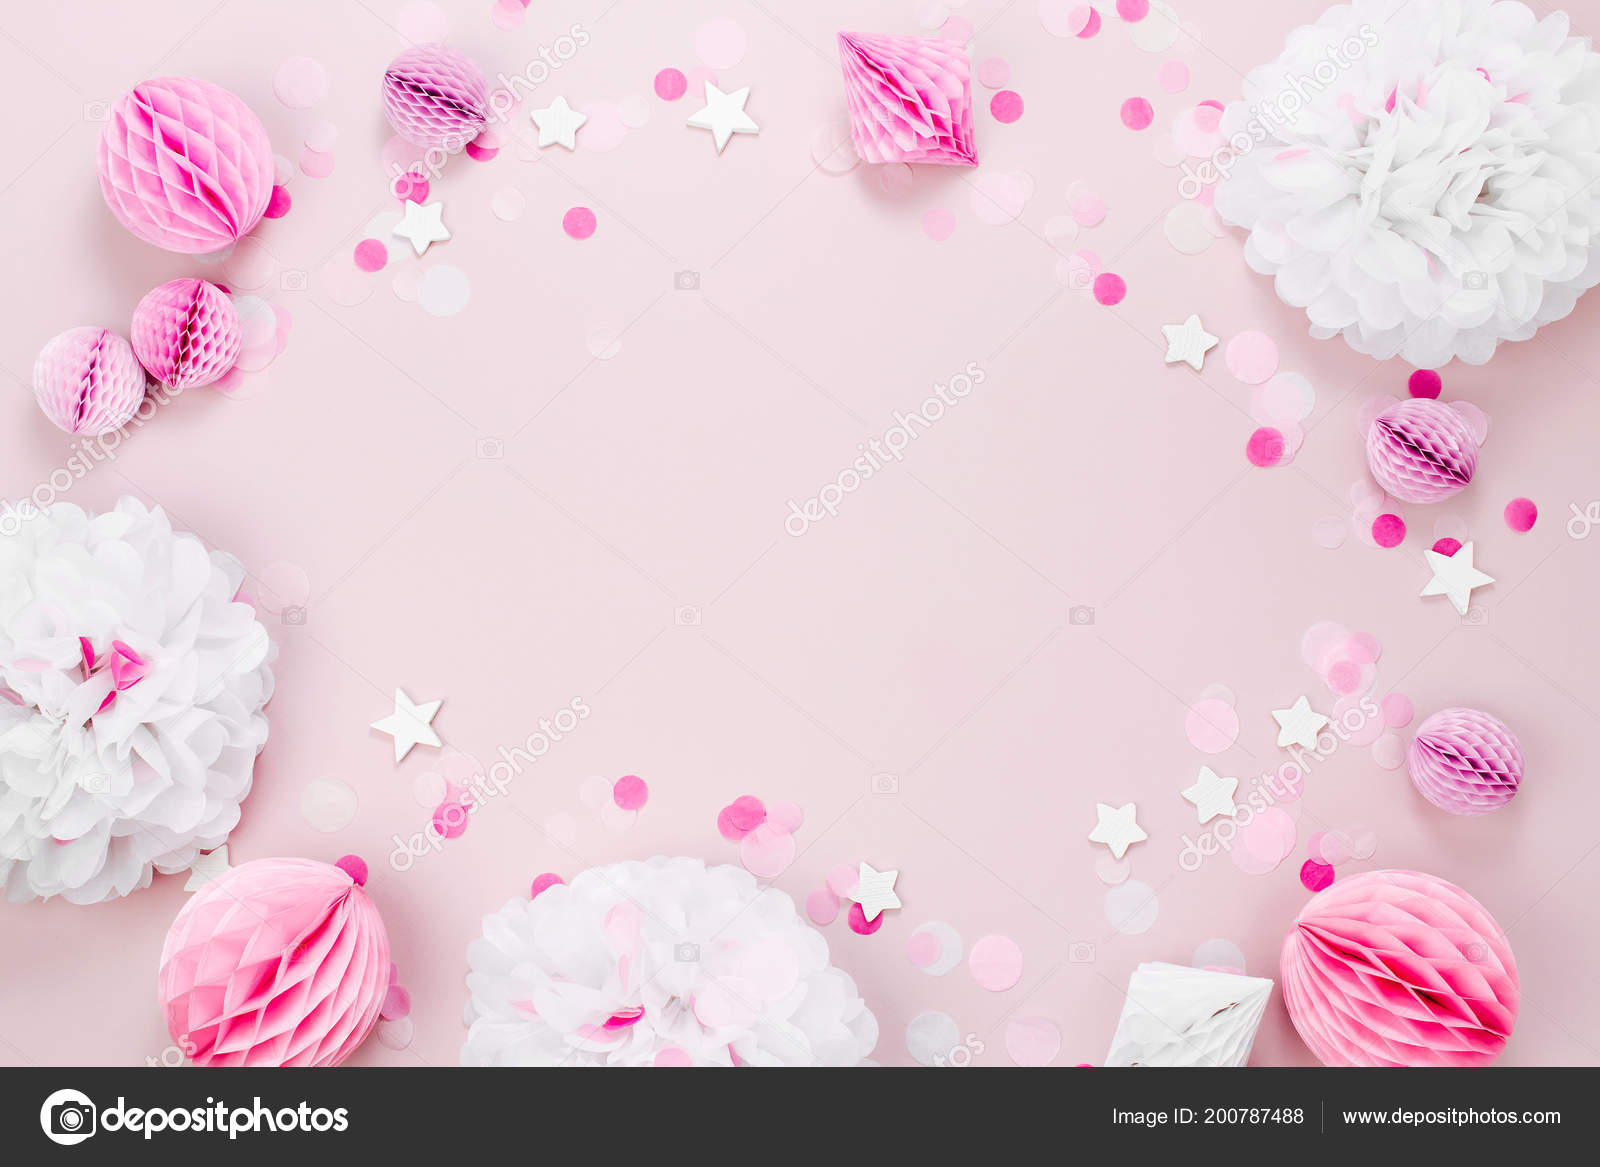 Moldura Feita Rosa Branco Papel Decoracoes Para Bebe Festa Vista